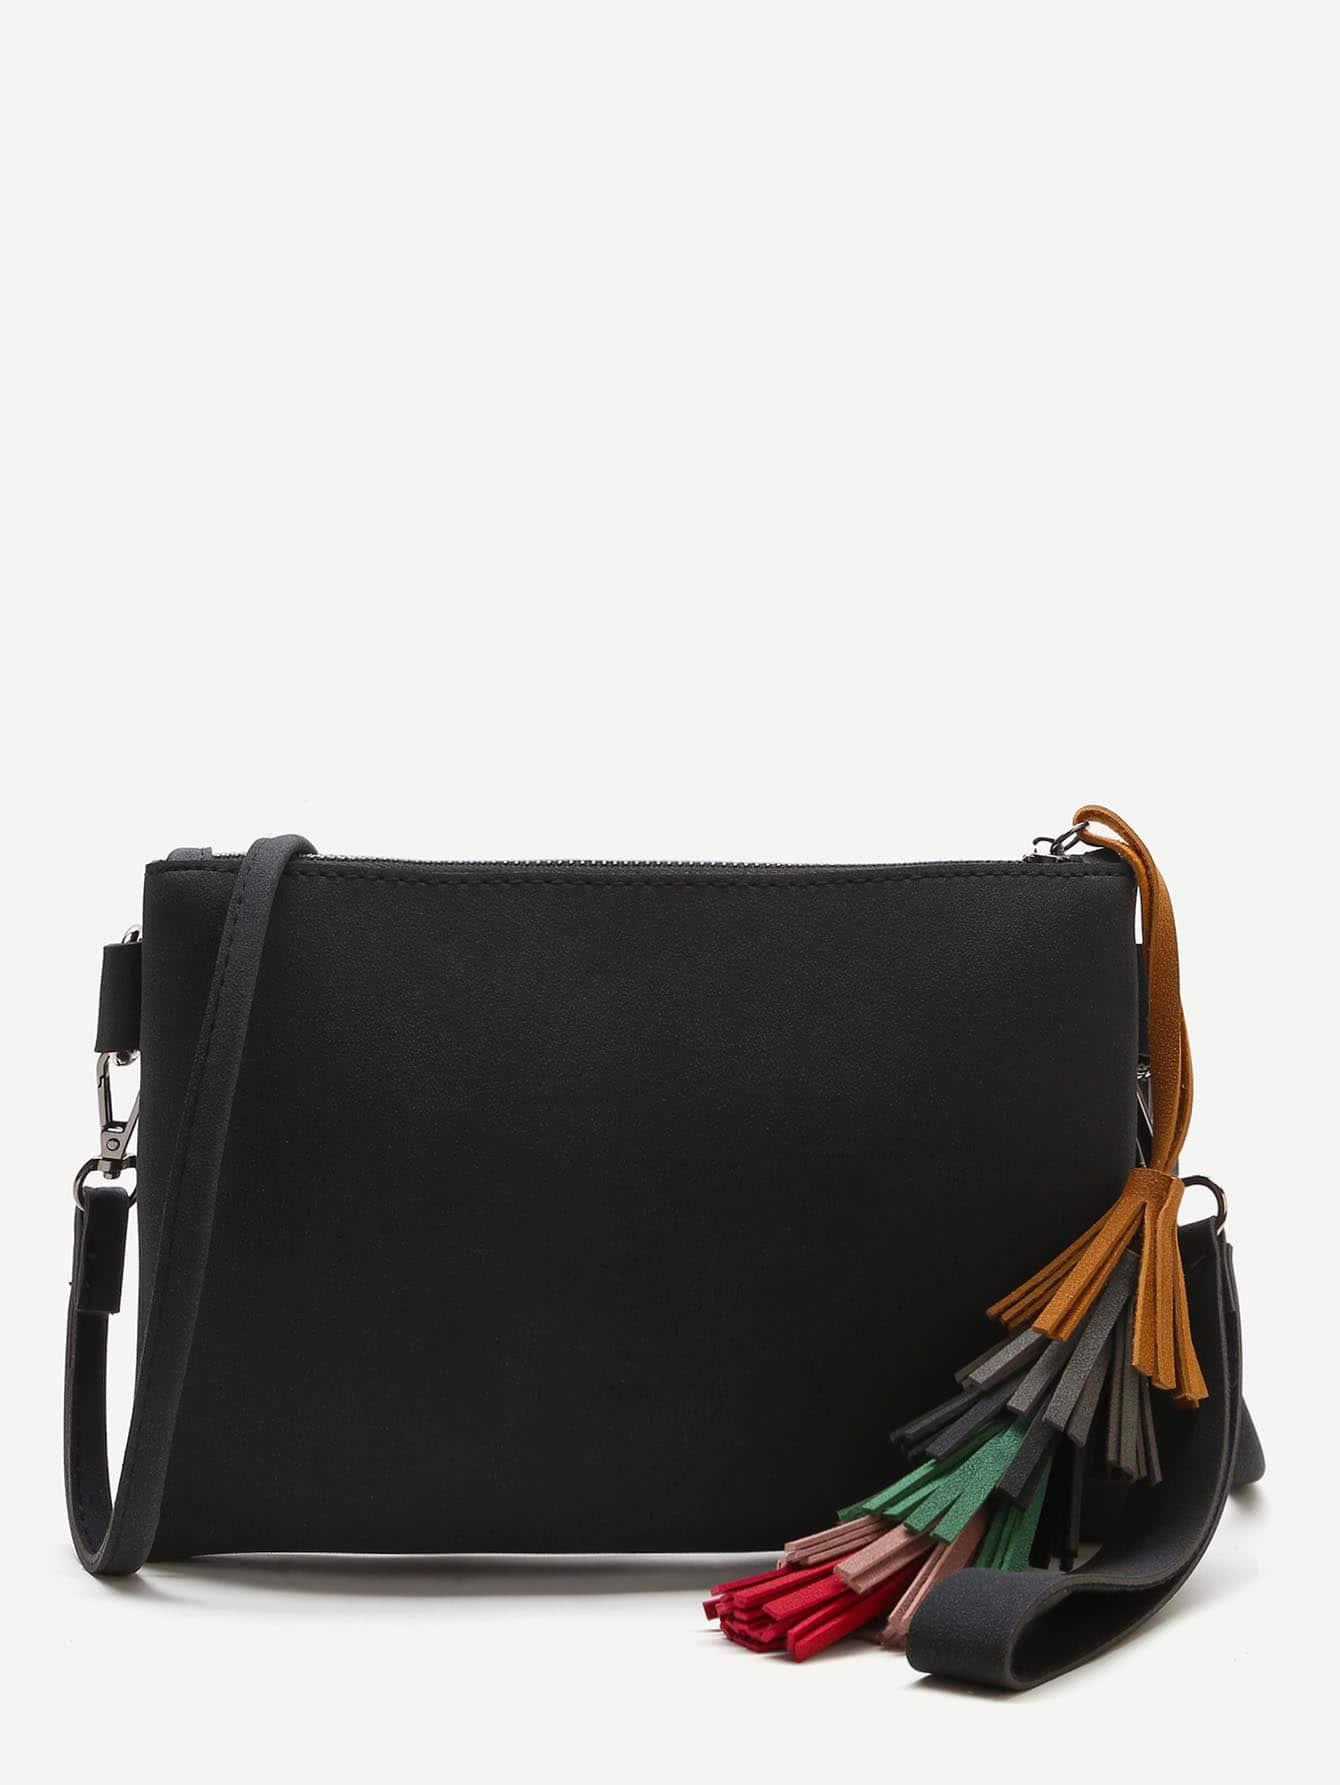 Фото Black Tassel Detail Clutch Bag With Strap. Купить с доставкой